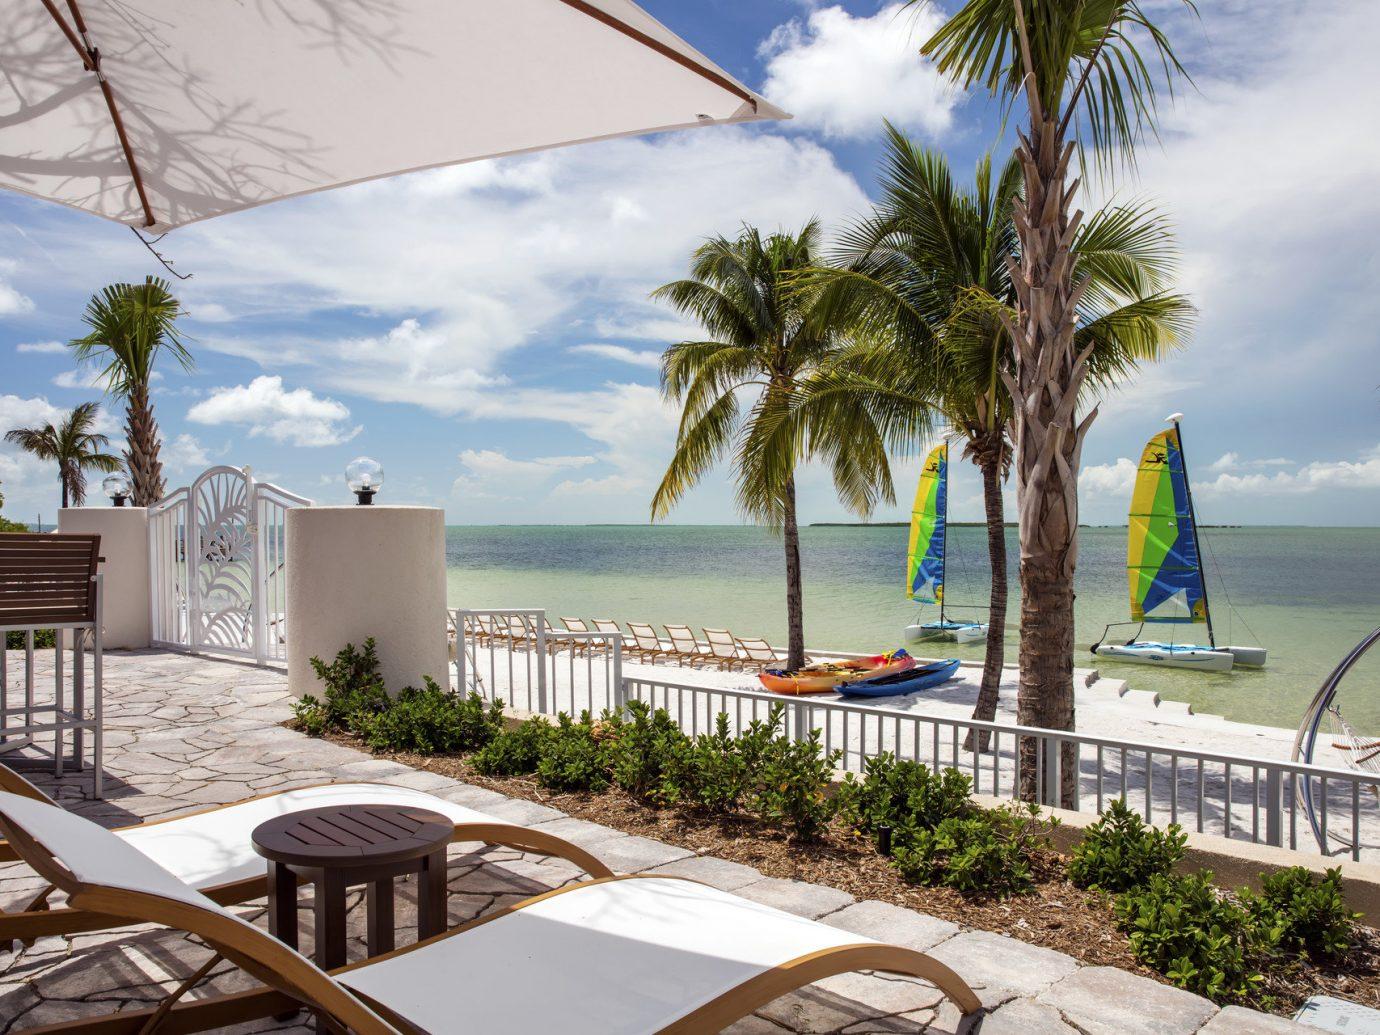 Florida Miami Trip Ideas Weekend Getaways tree outdoor sky leisure property palm vacation estate caribbean Resort home arecales Beach Villa swimming pool area furniture several